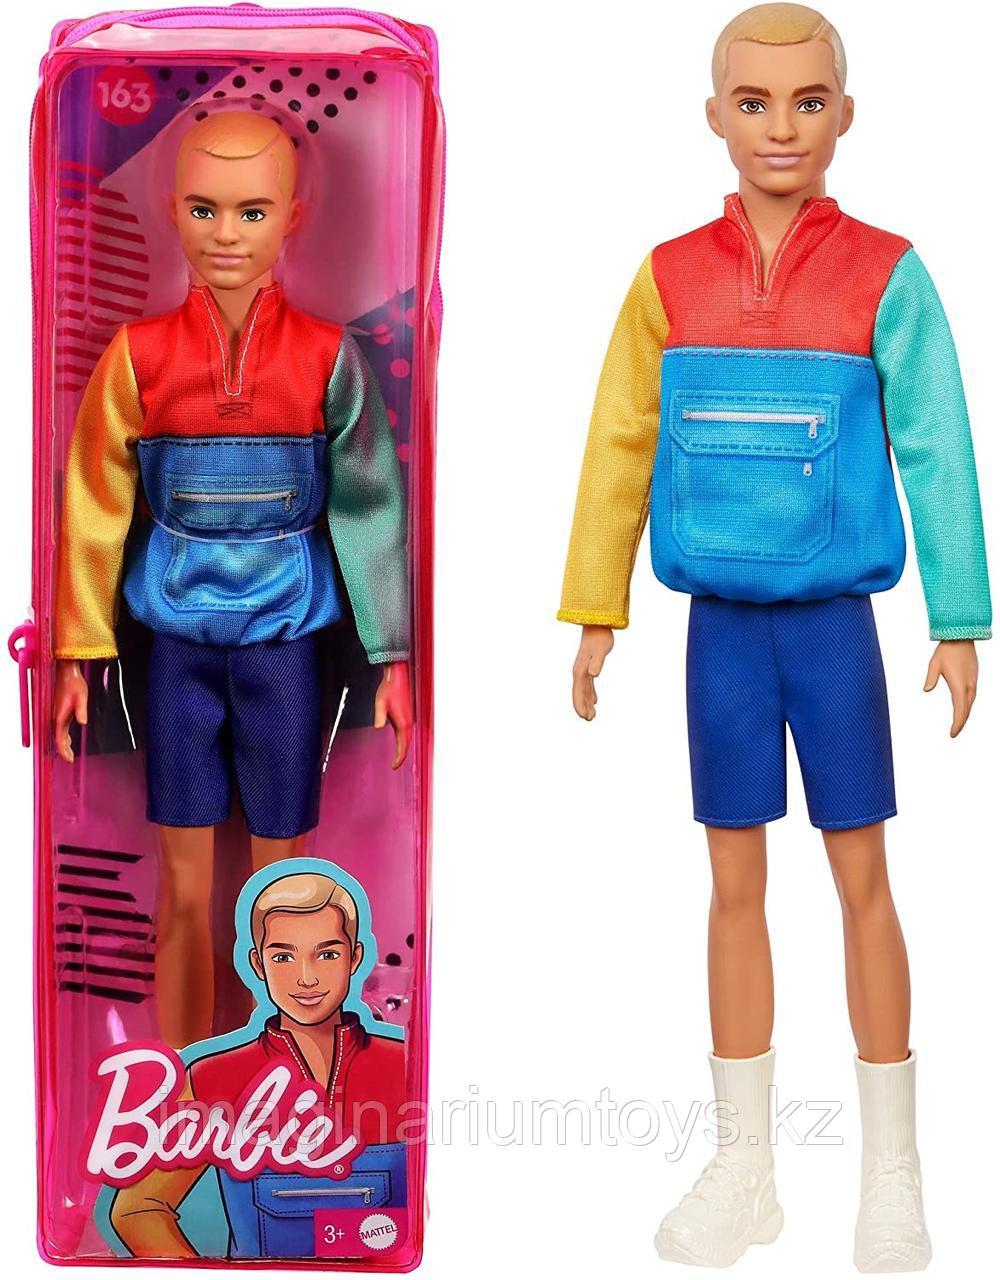 Кукла Кен блондин #163 Barbie